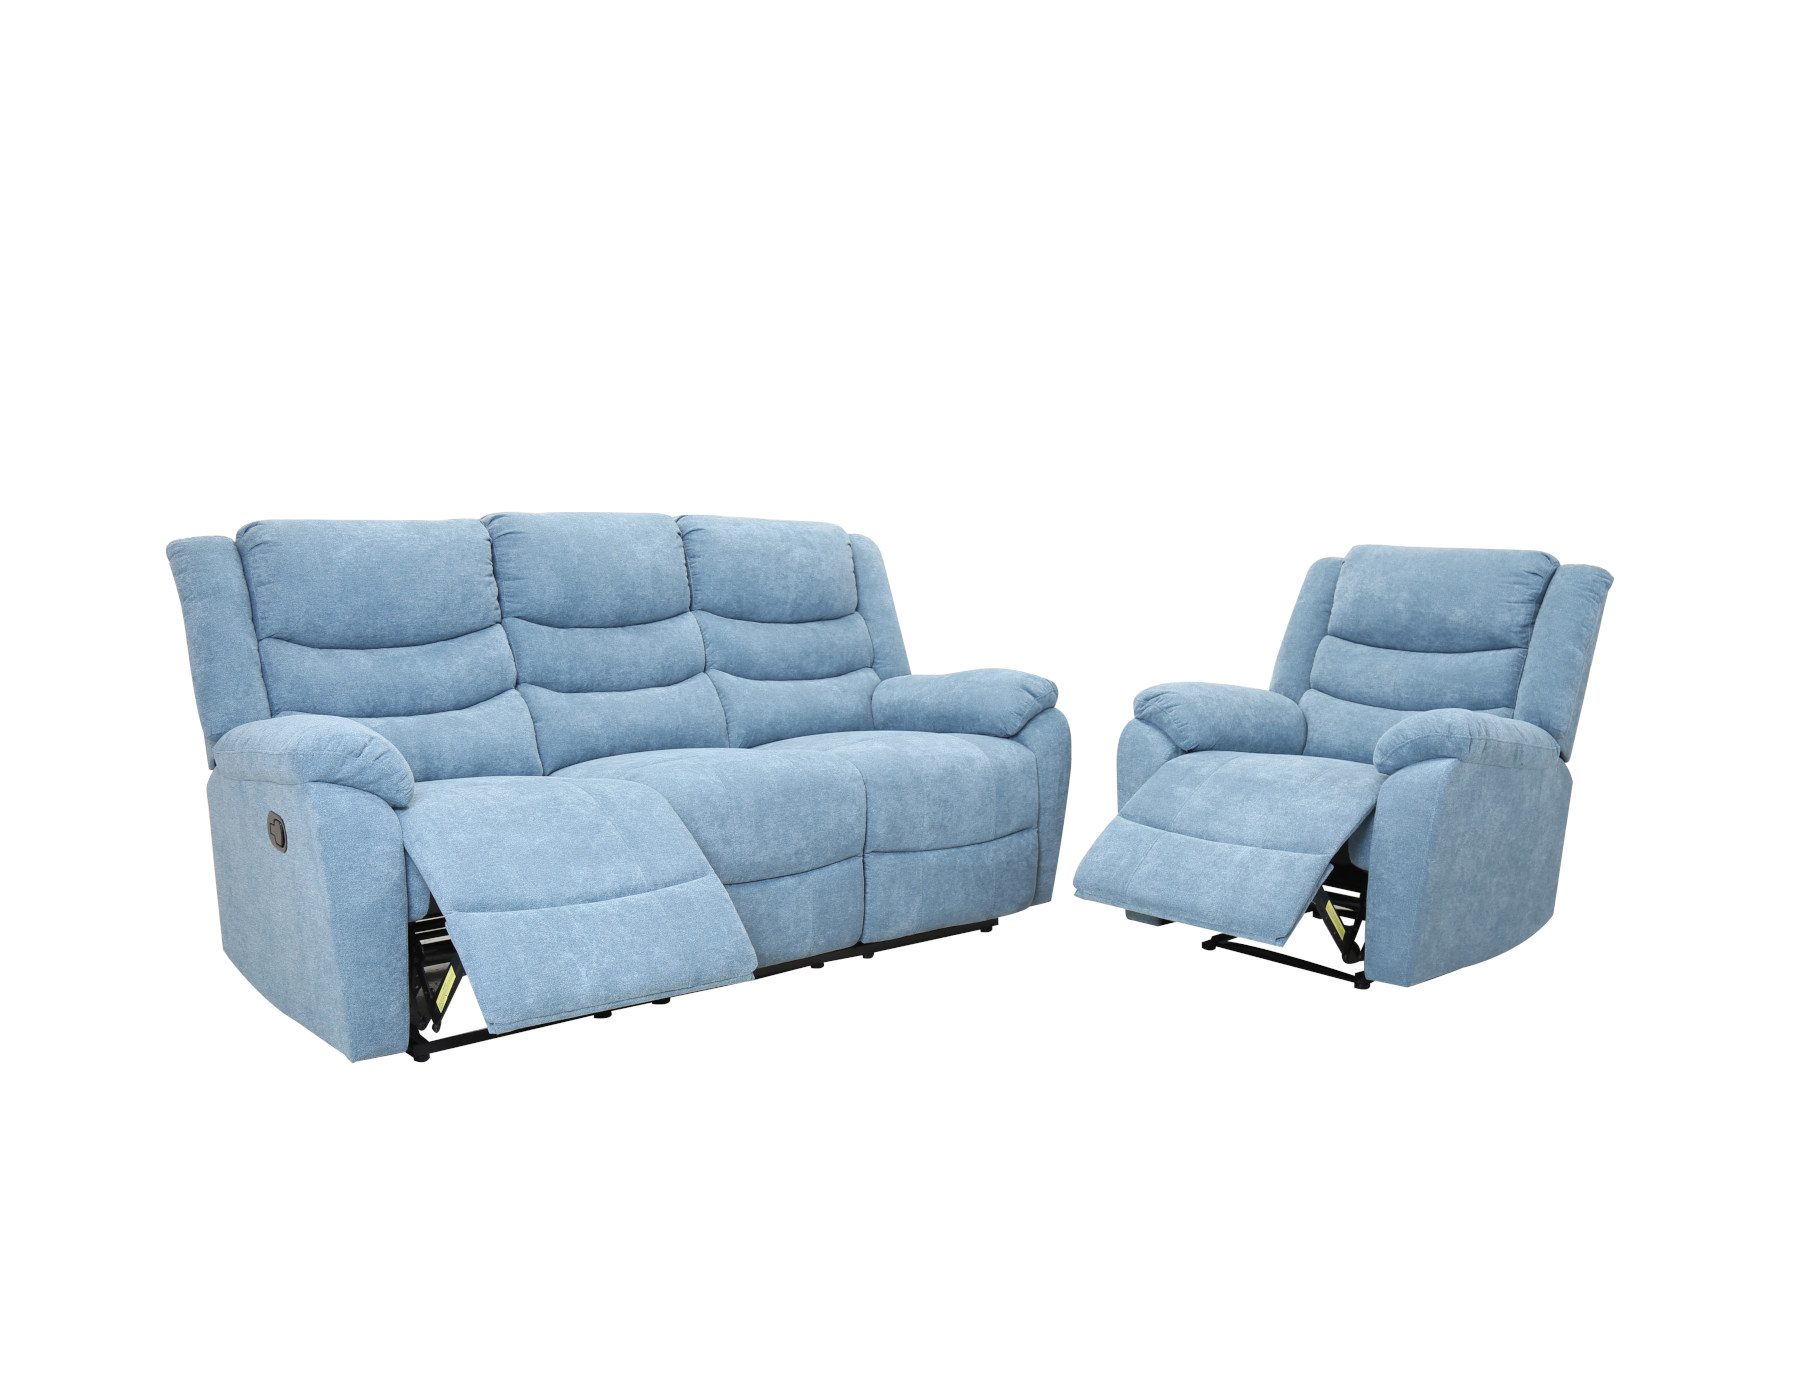 23569 – Sofa & Chair – PR-BAR – Open